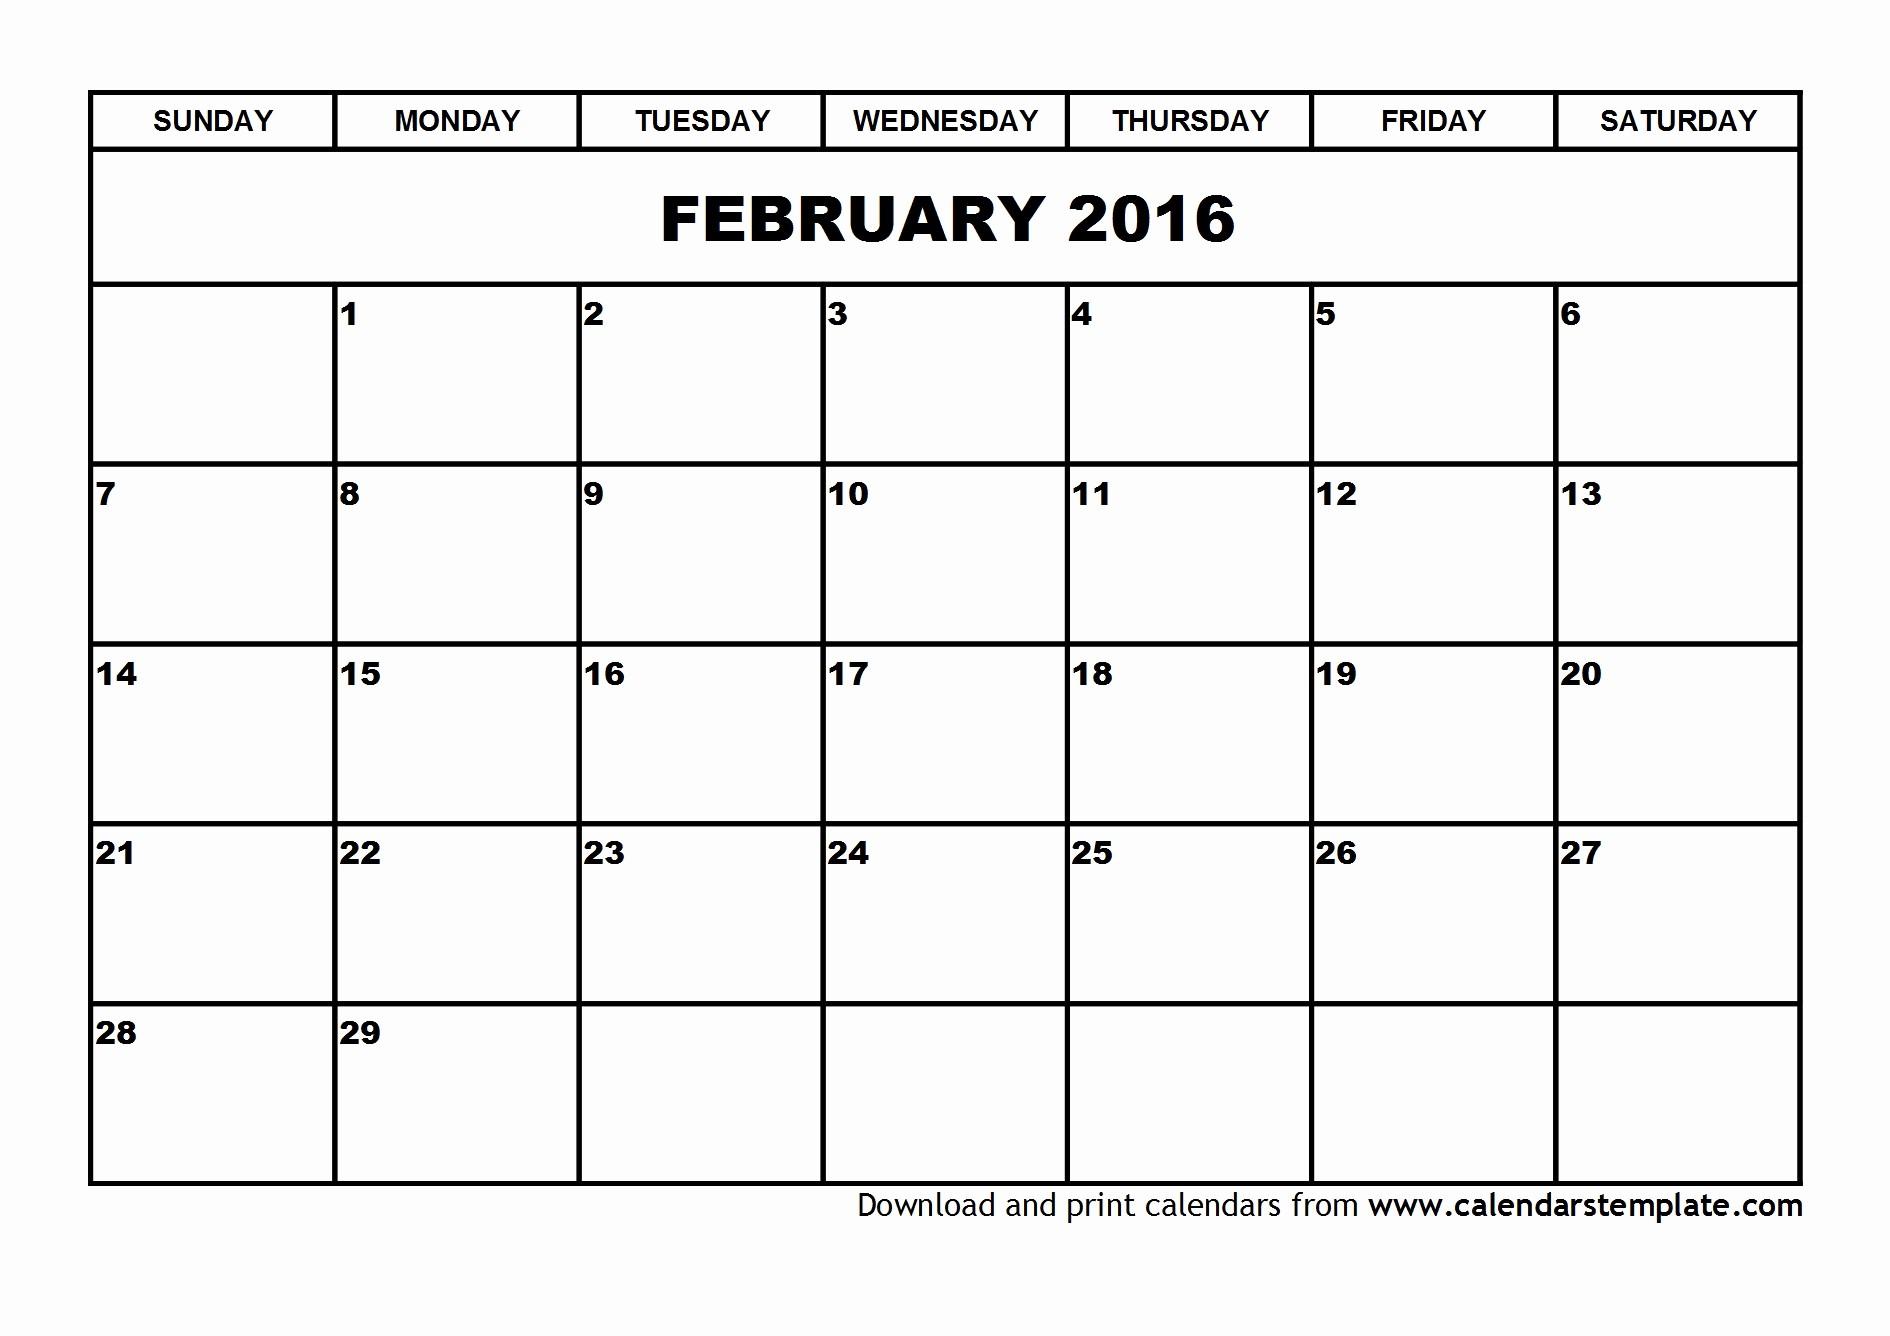 Free Printable Calendars 2016 Templates Luxury February 2016 Calendar Template